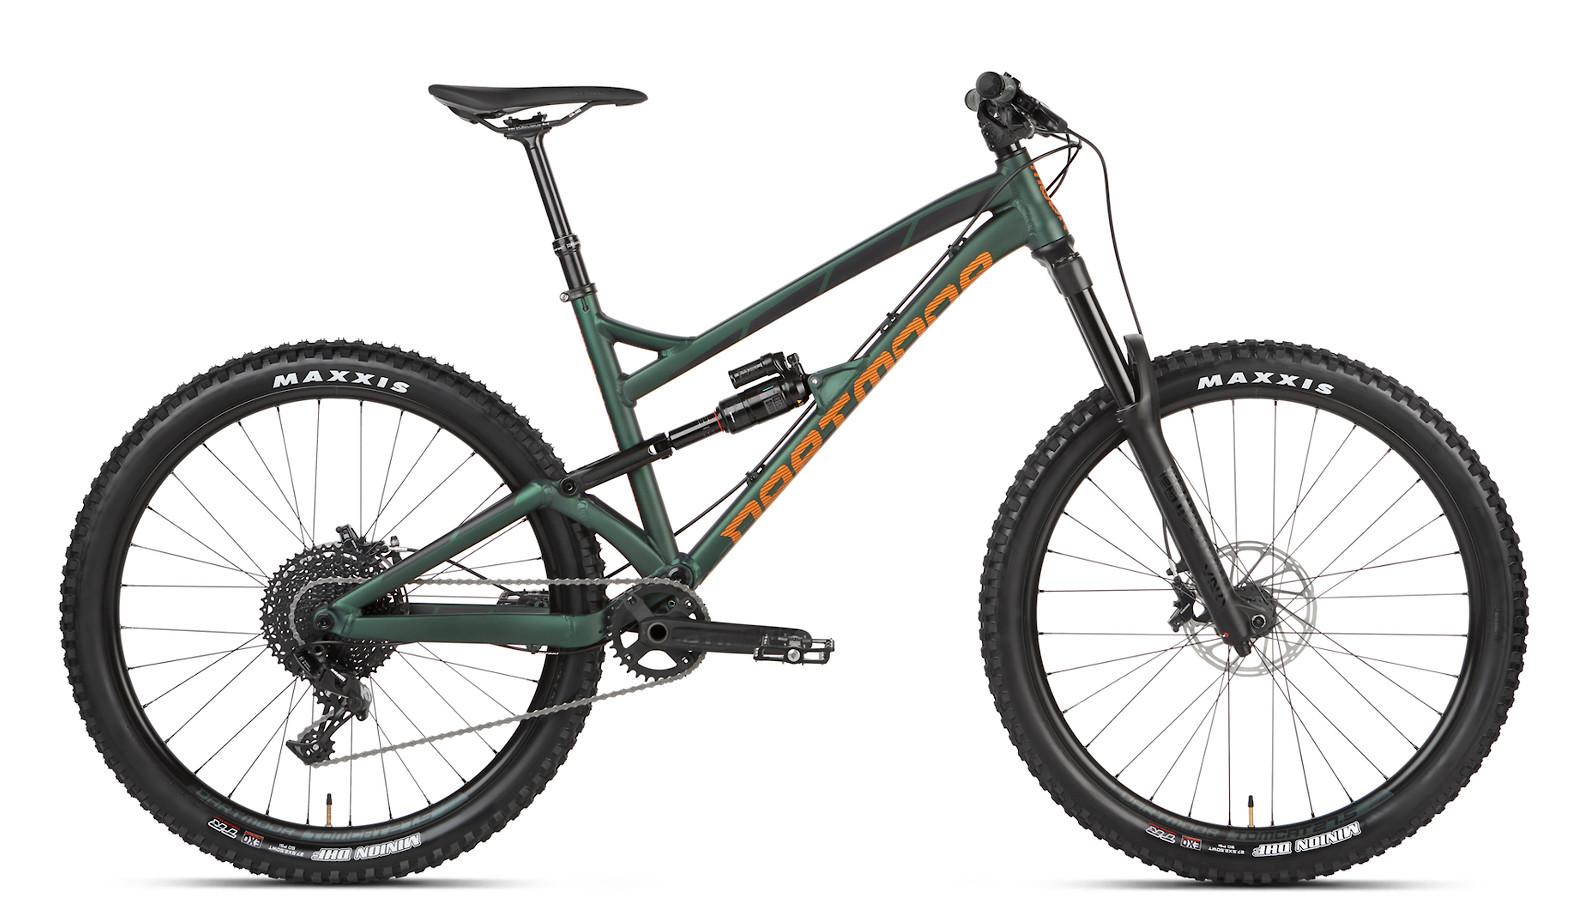 2019 Dartmoor Blackbird EVO 27.5 Bike